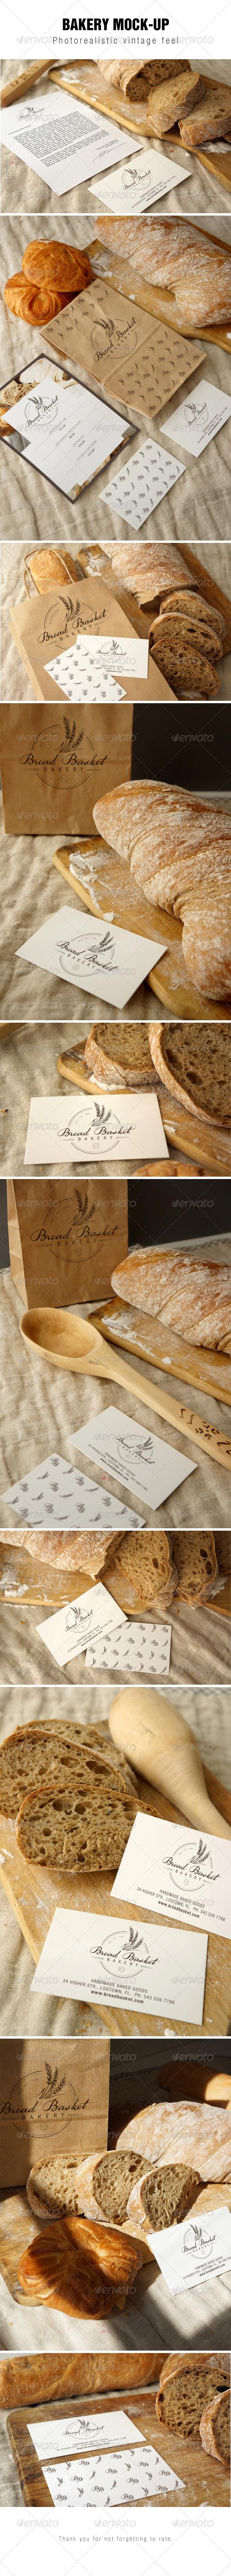 GraphicRiver Bakery Branding Mockup 8475026